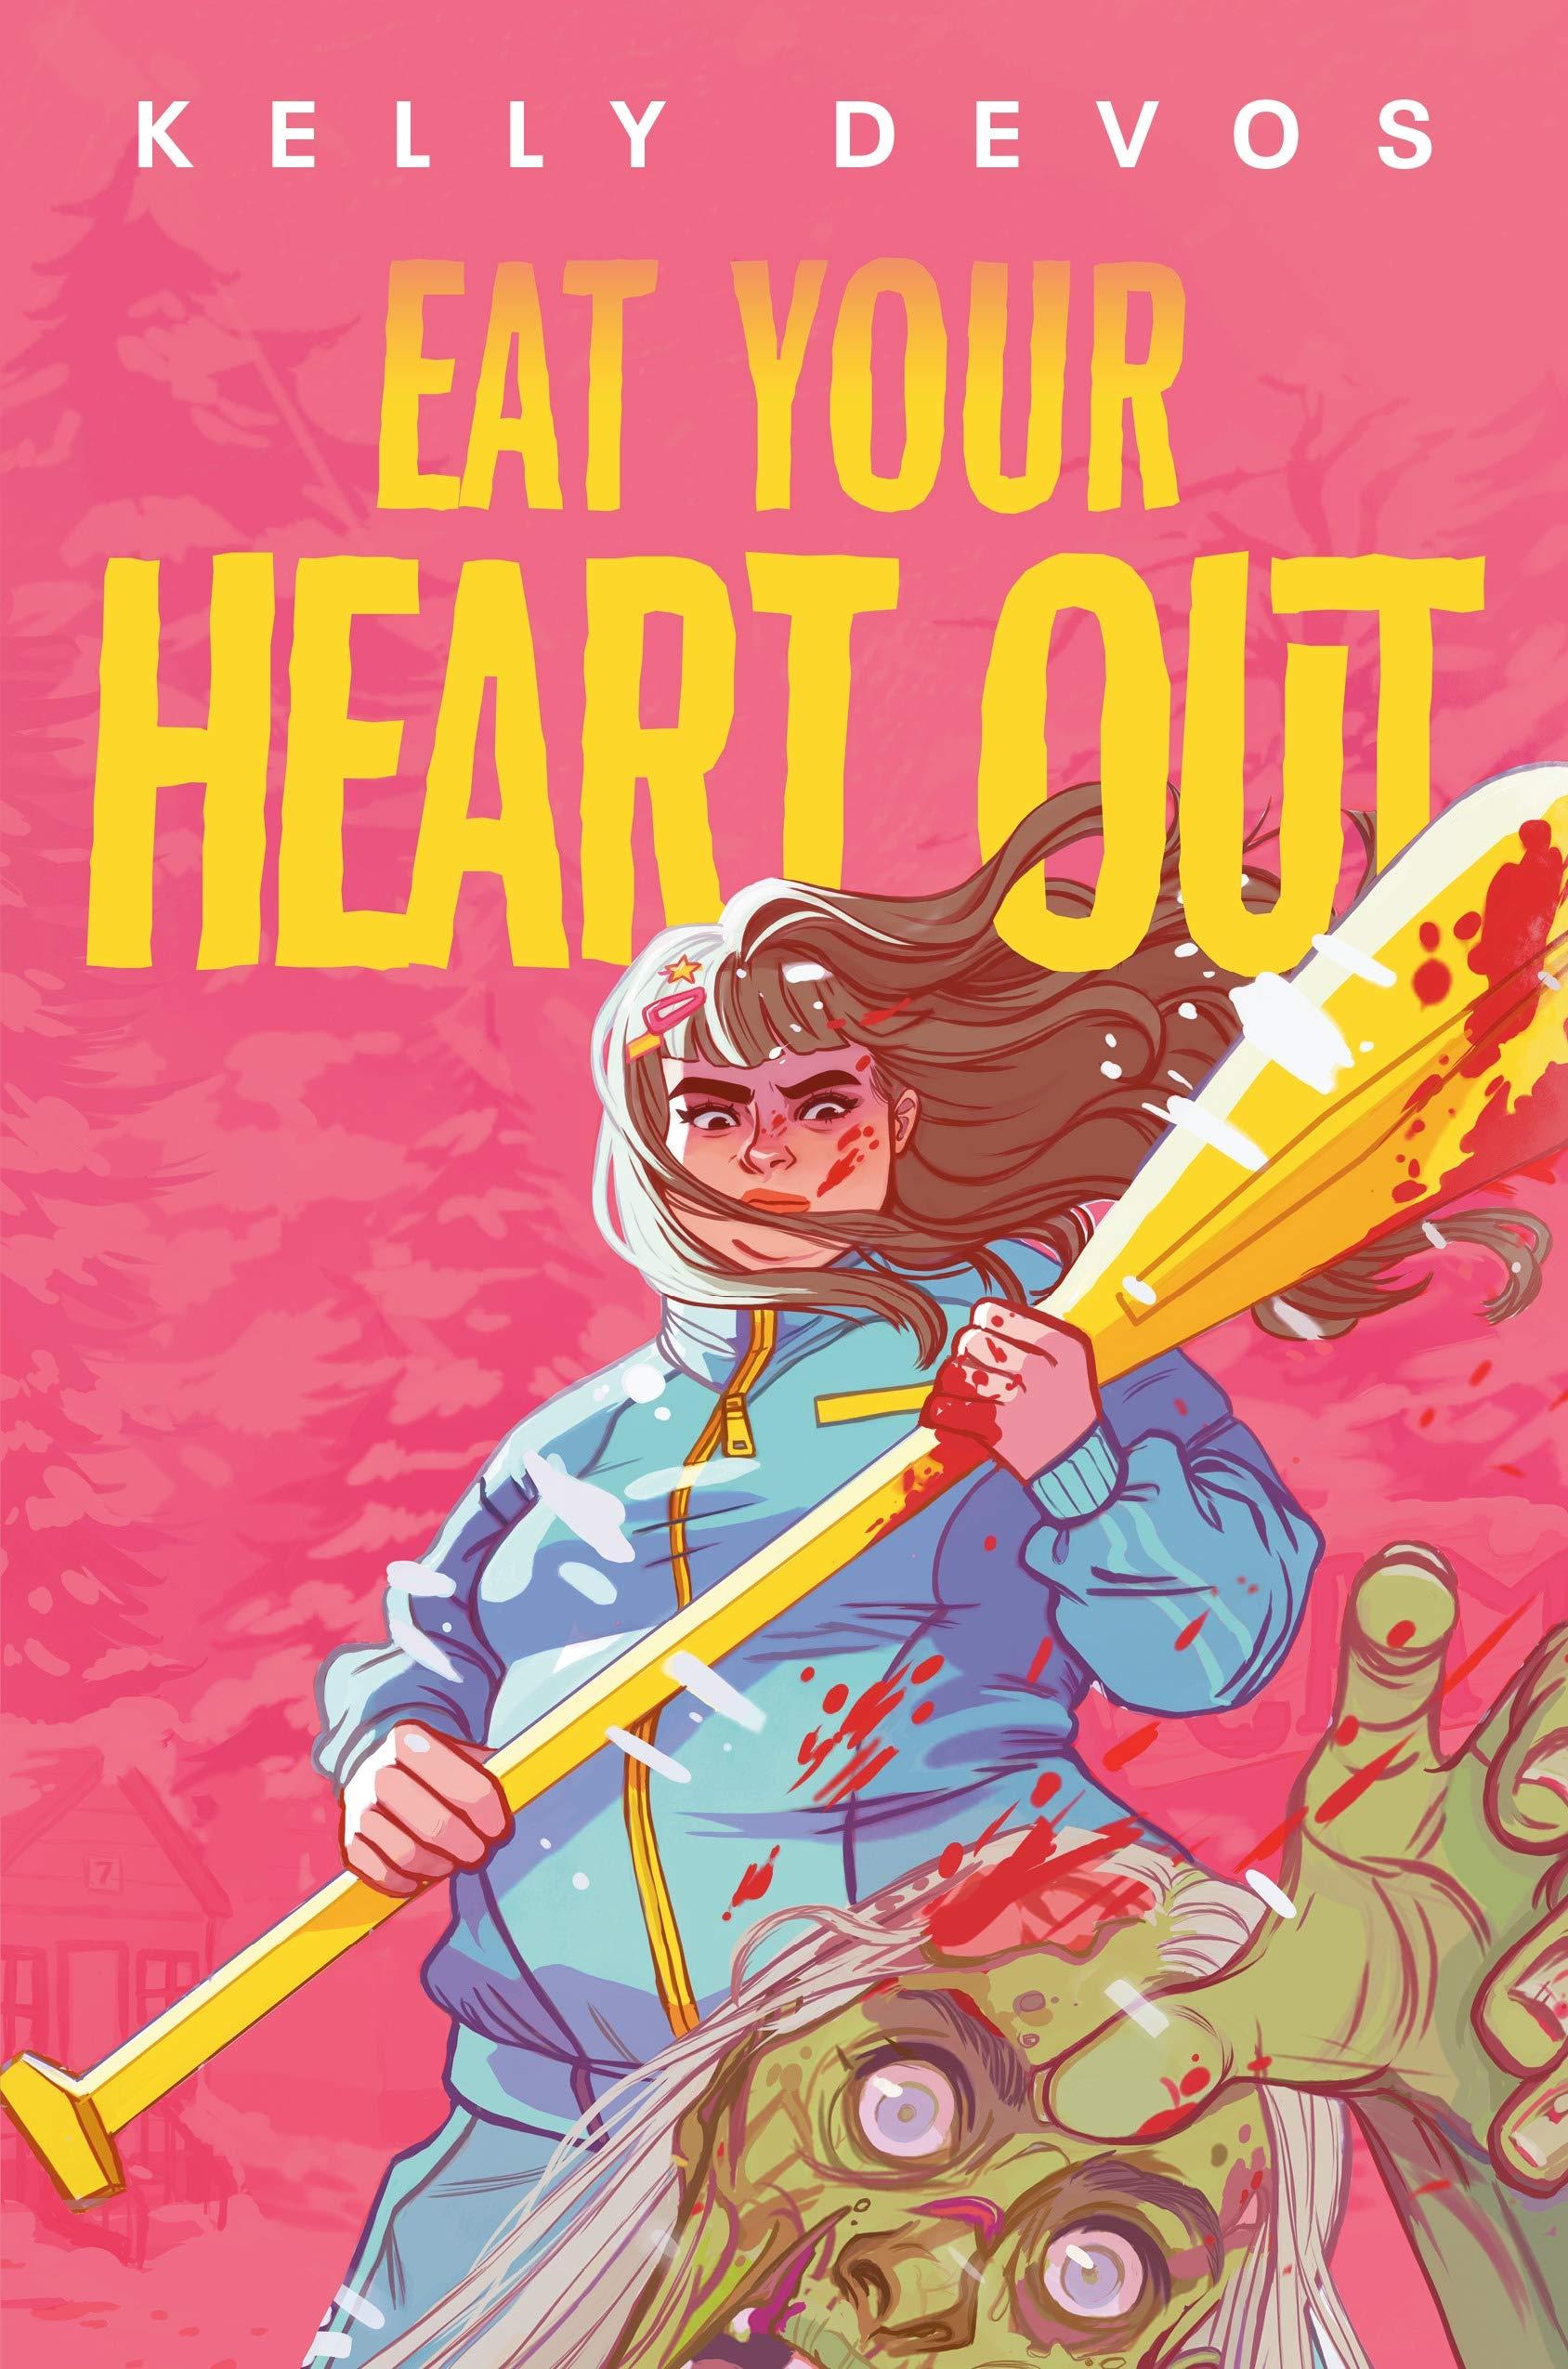 Amazon.com: Eat Your Heart Out (9780593204825): deVos, Kelly: Books